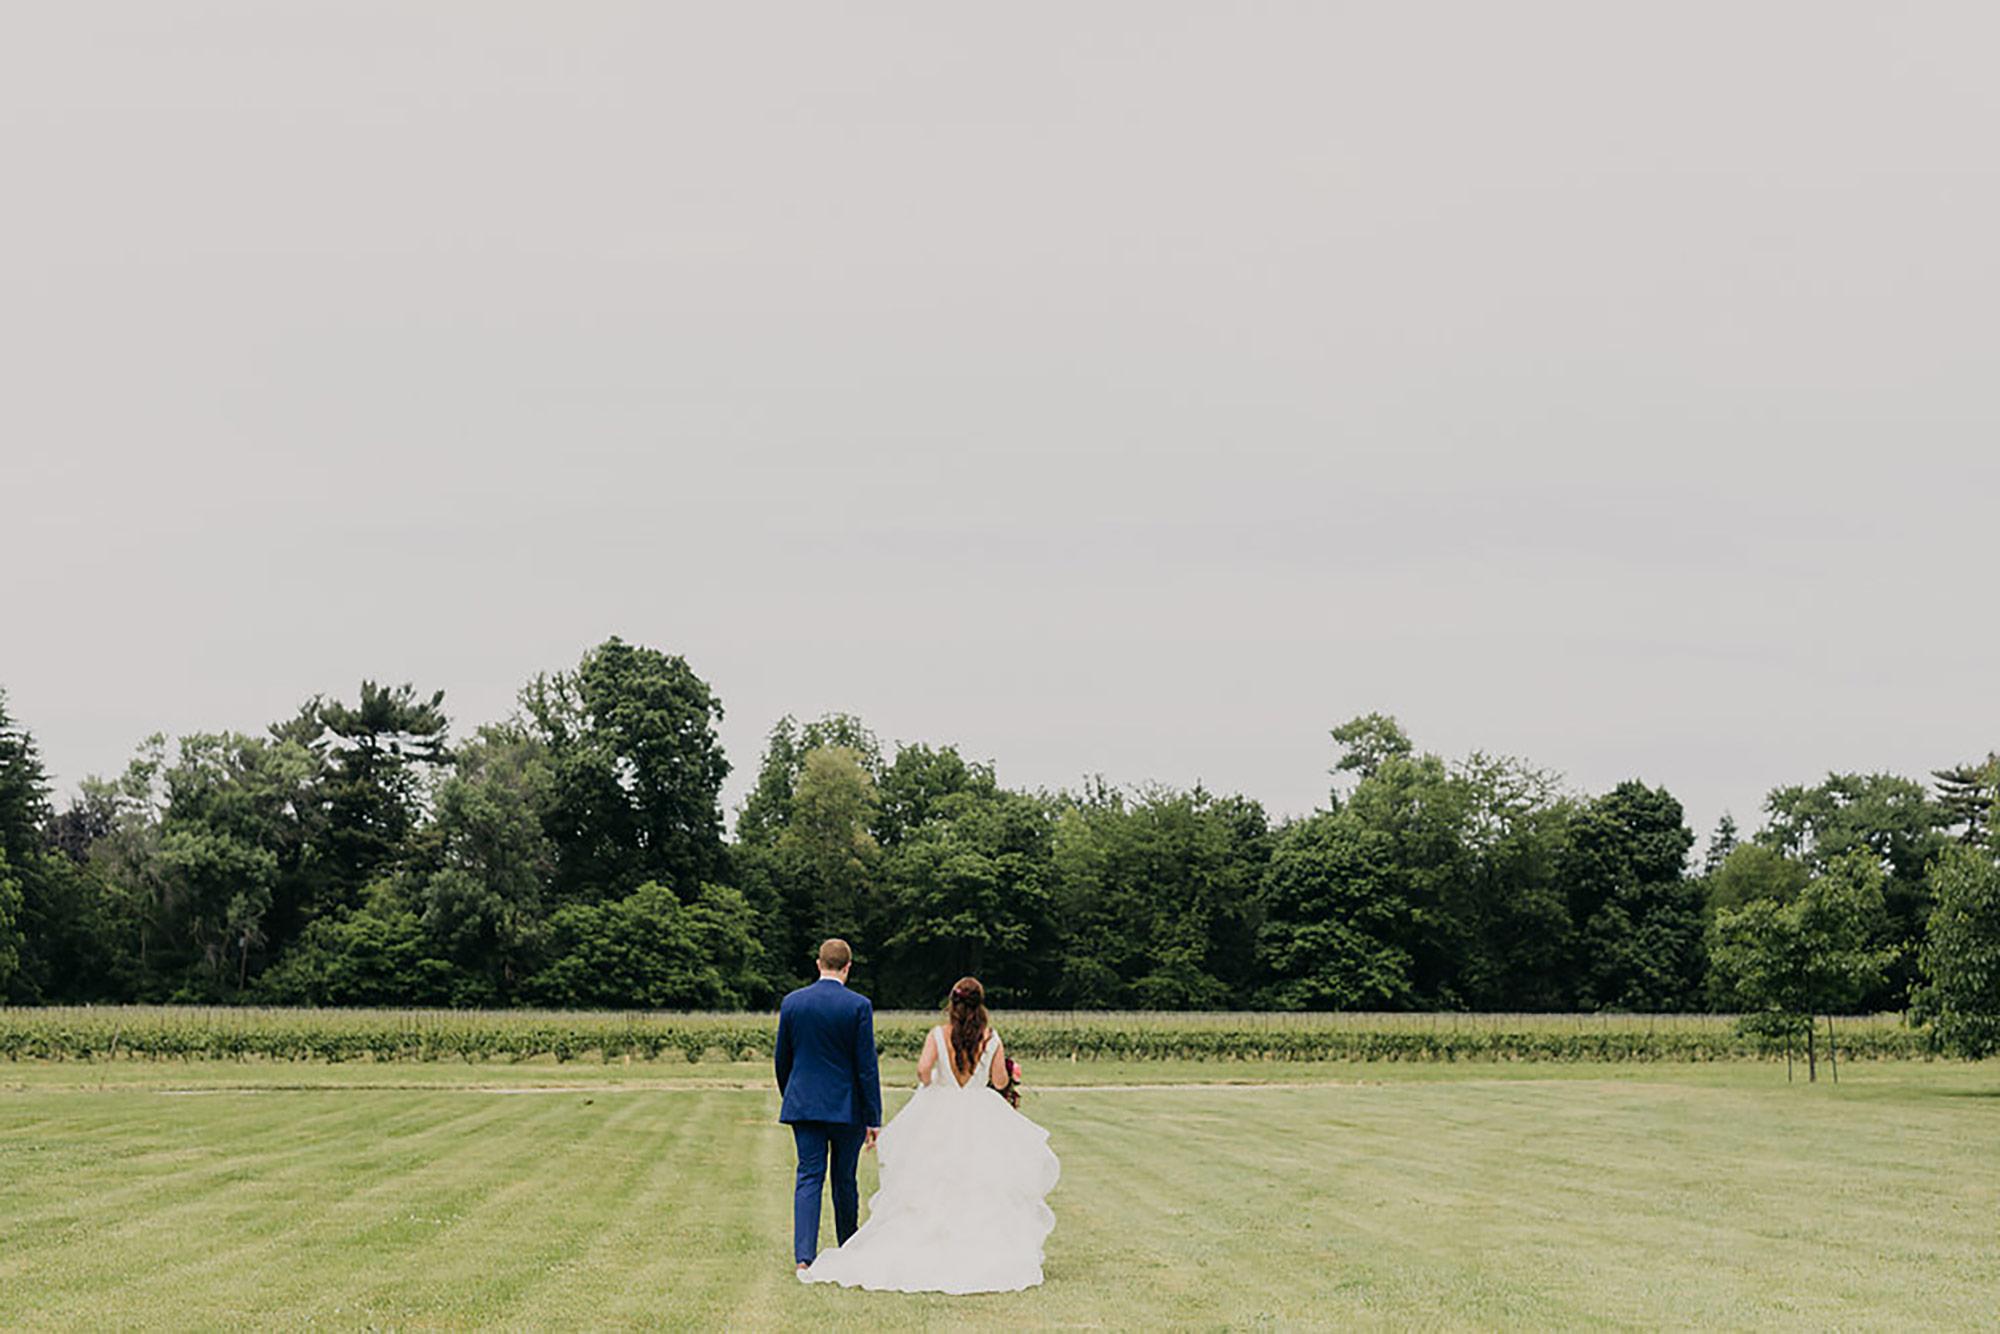 Kurtz-Orchards-Wedding-Niagara-wedding-Vineyard-Bride-Photography-by-Kayla-Rocca-010.JPG